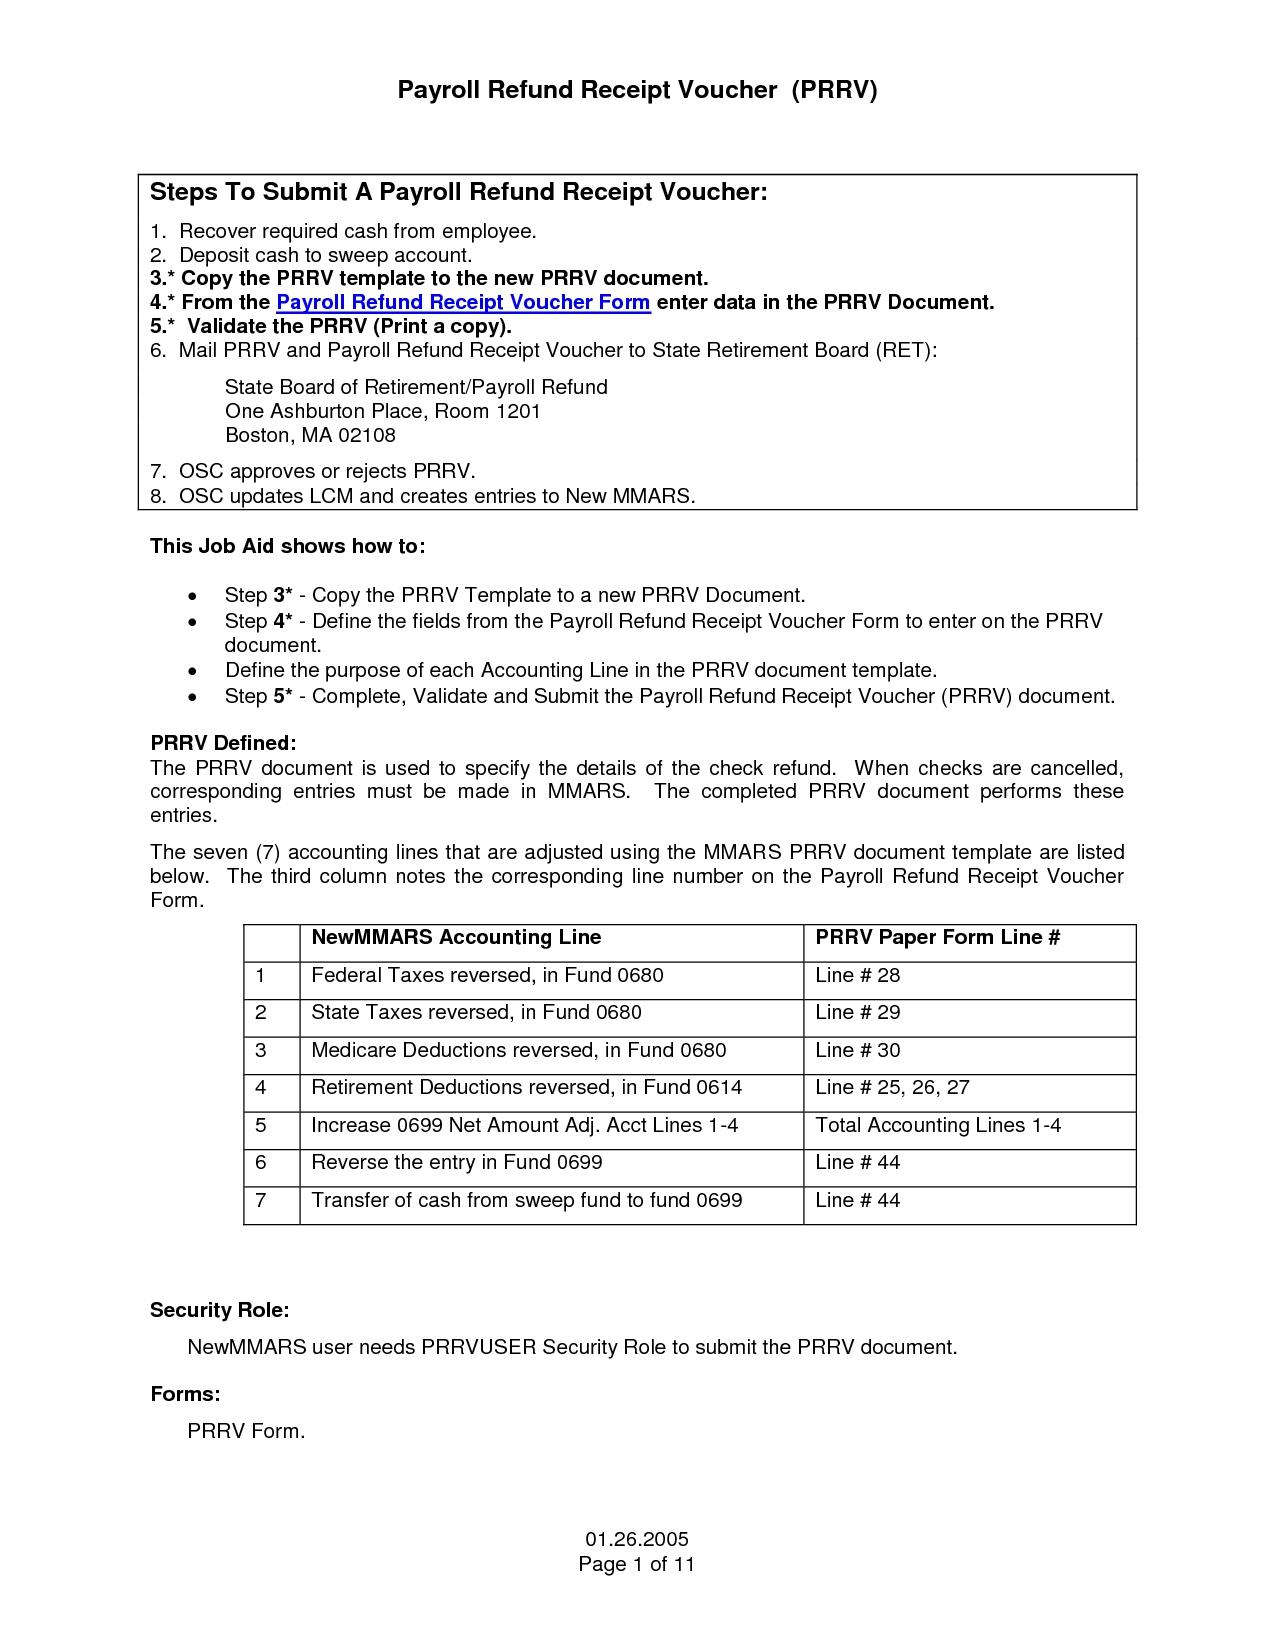 Attractive Sample Of Receipt Form 17 Best Photos Of Payroll Voucher Template Free Payroll  Template Payroll Invoice Template Sample Of Receipt Formhtml